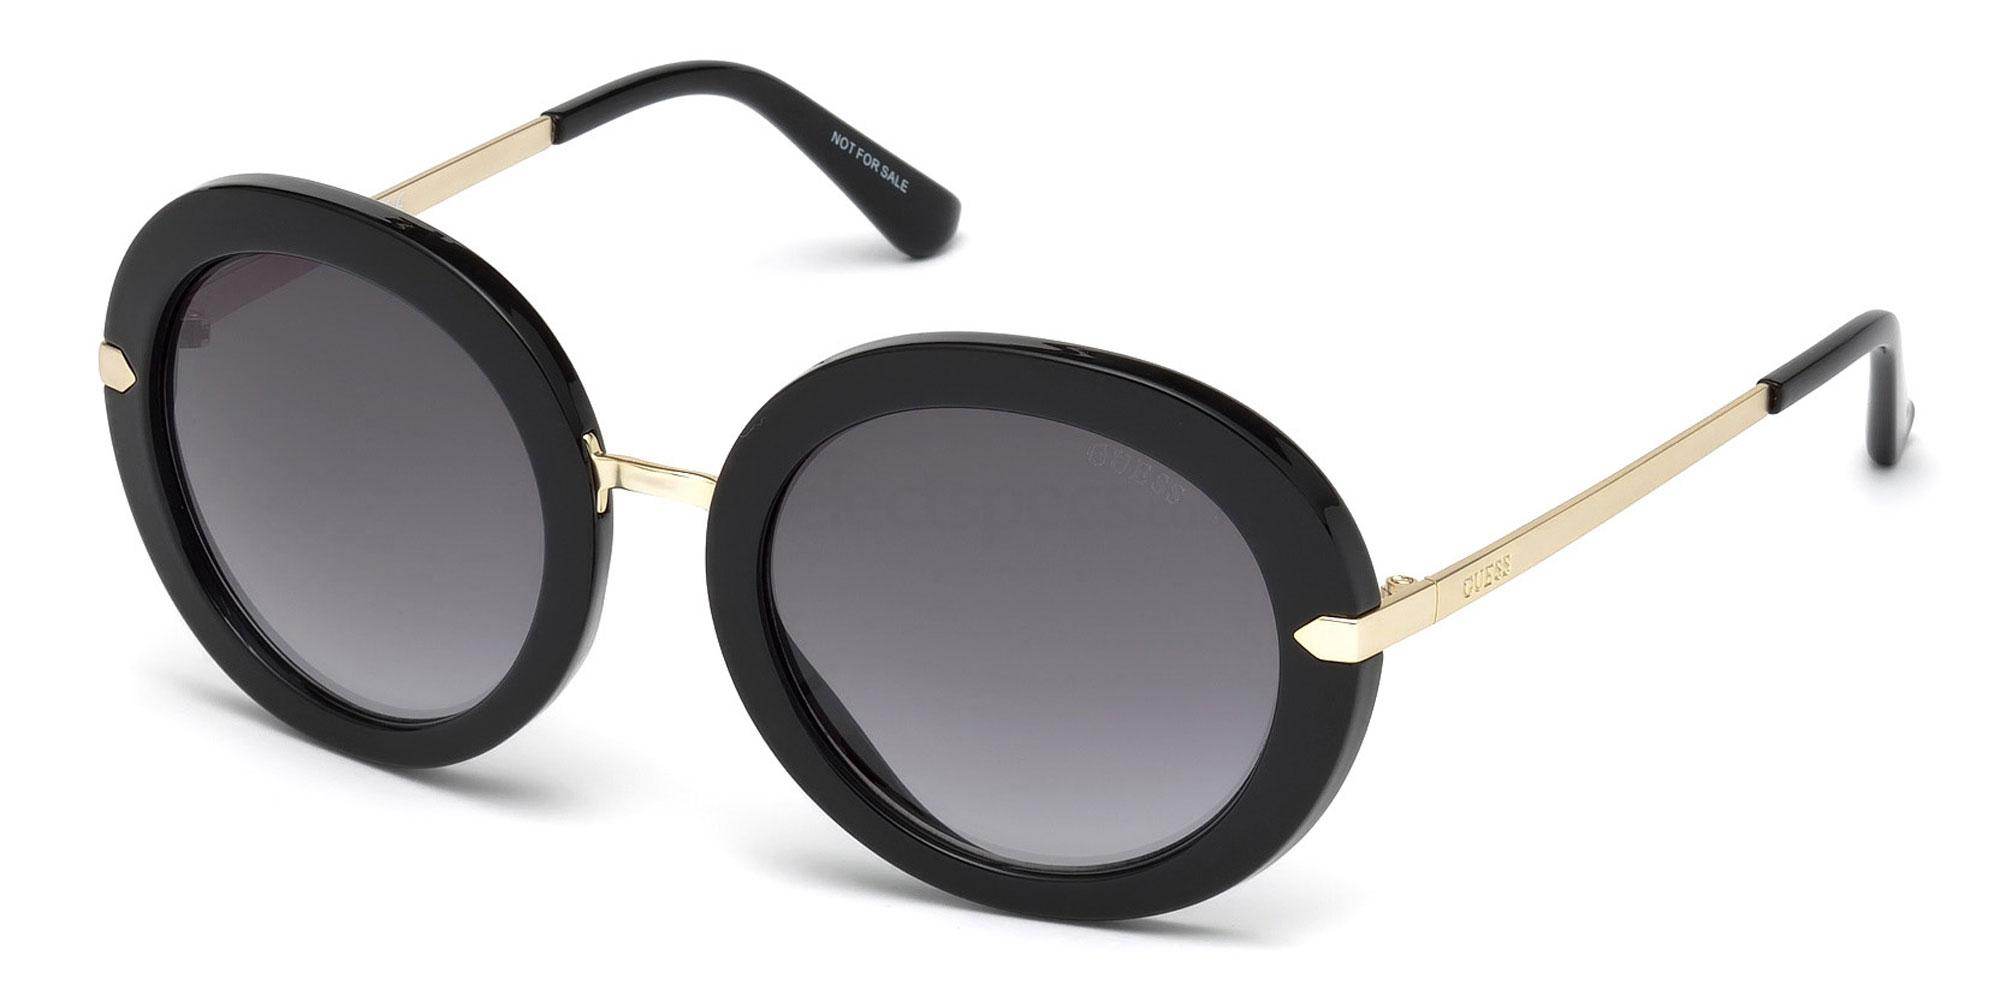 01B GU7514 Sunglasses, Guess